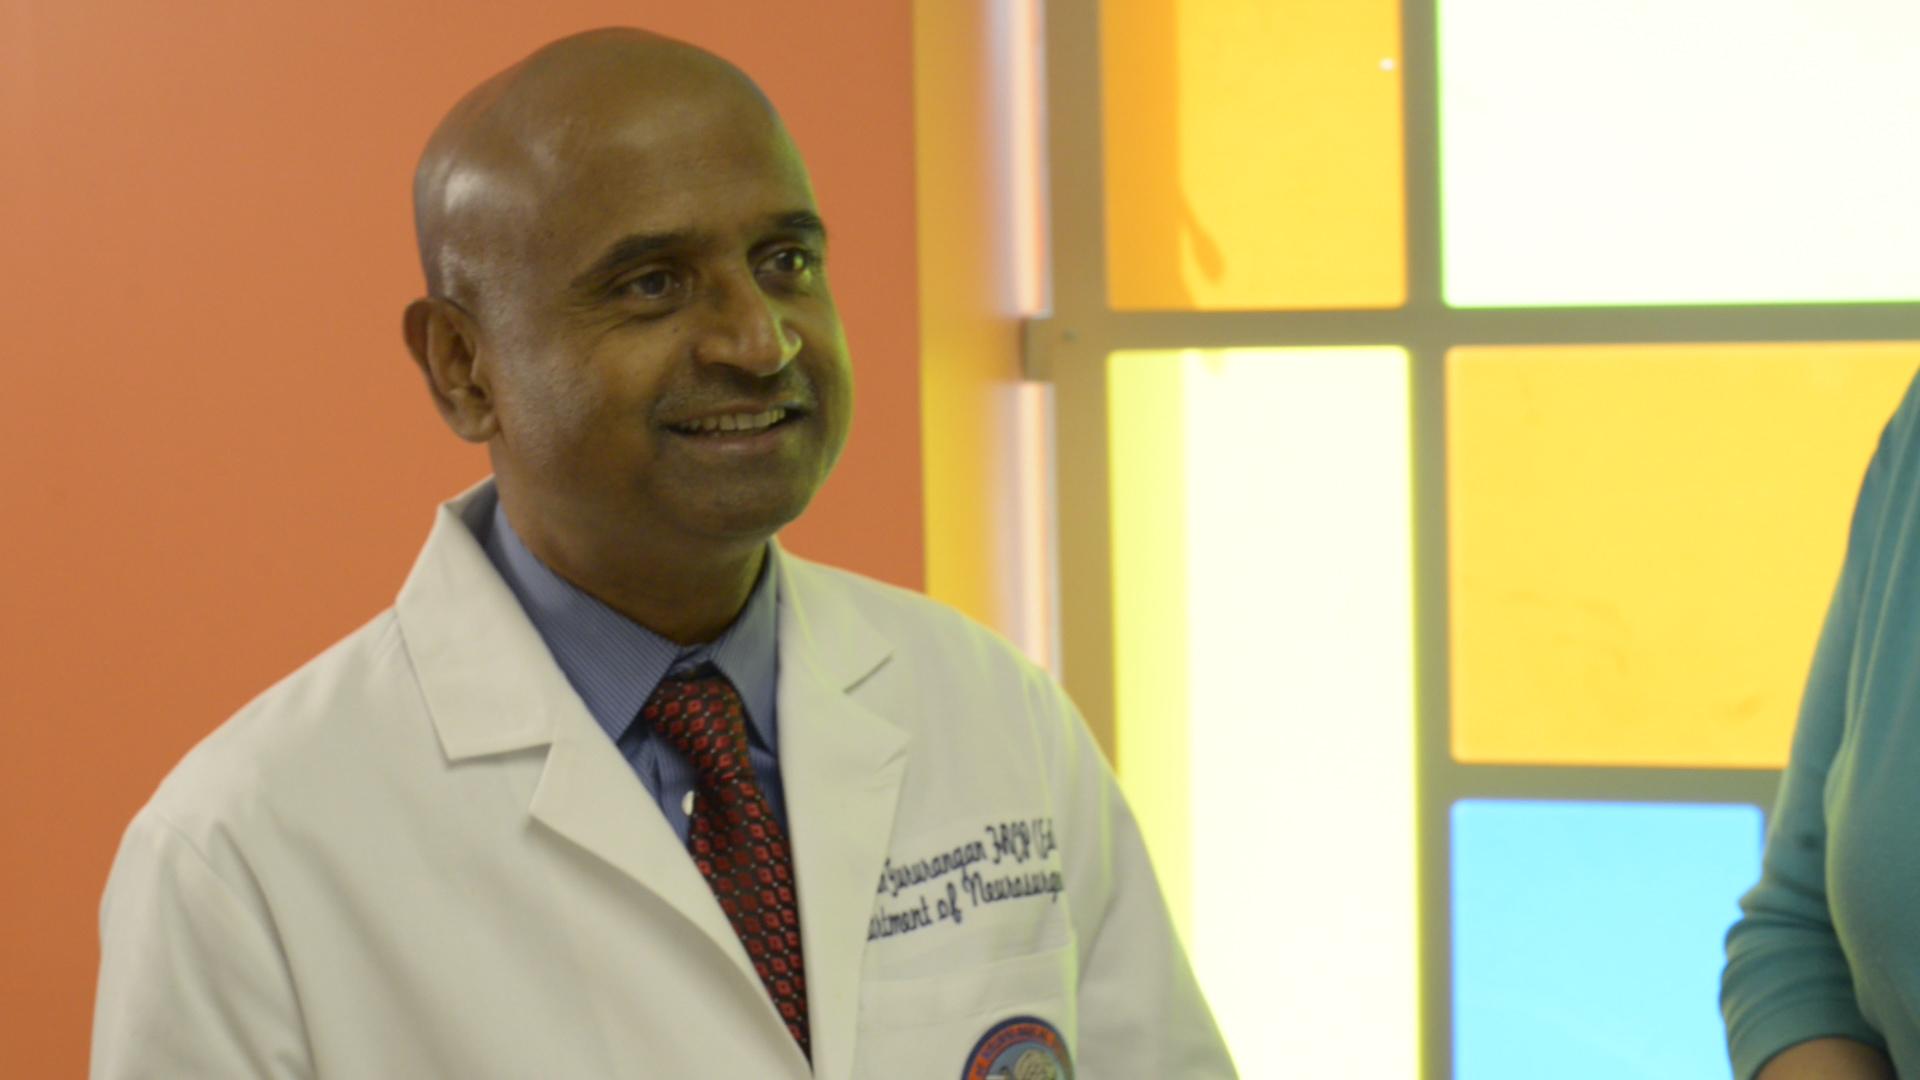 neuro oncology preston a wells jr center for brain tumor pediatrics